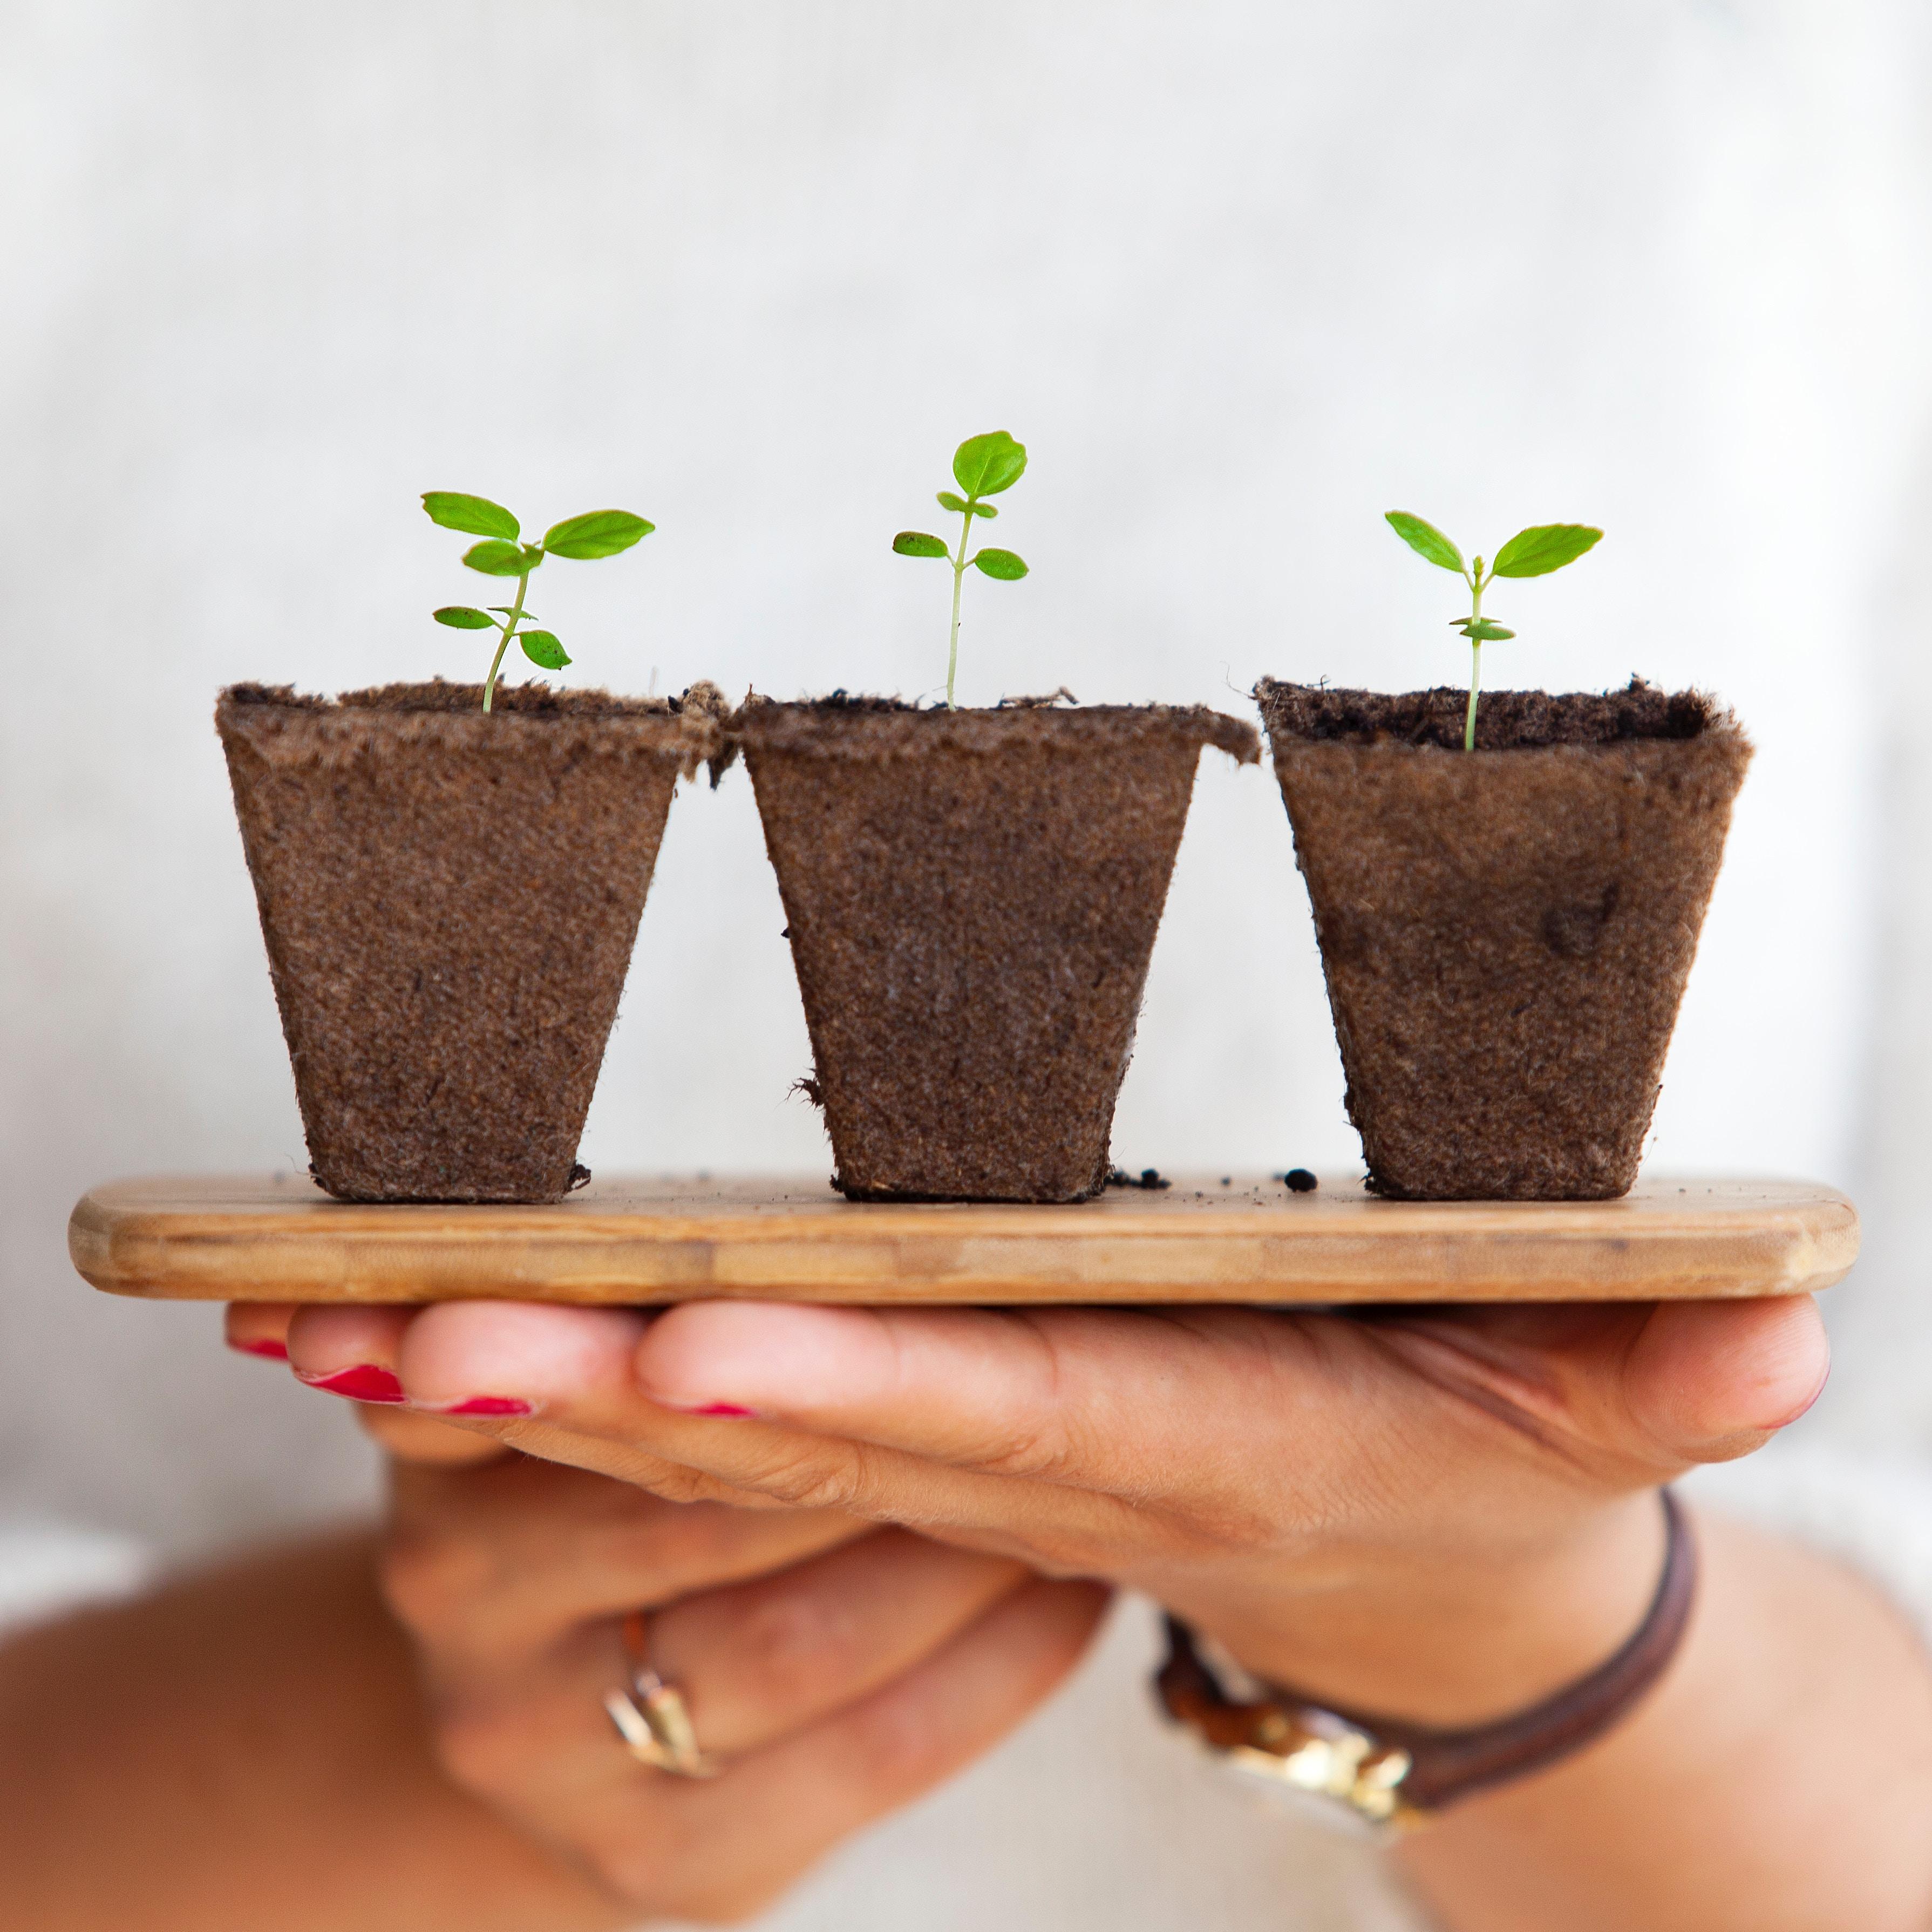 people management, HR, SME, Small Business, Growth, Nurture